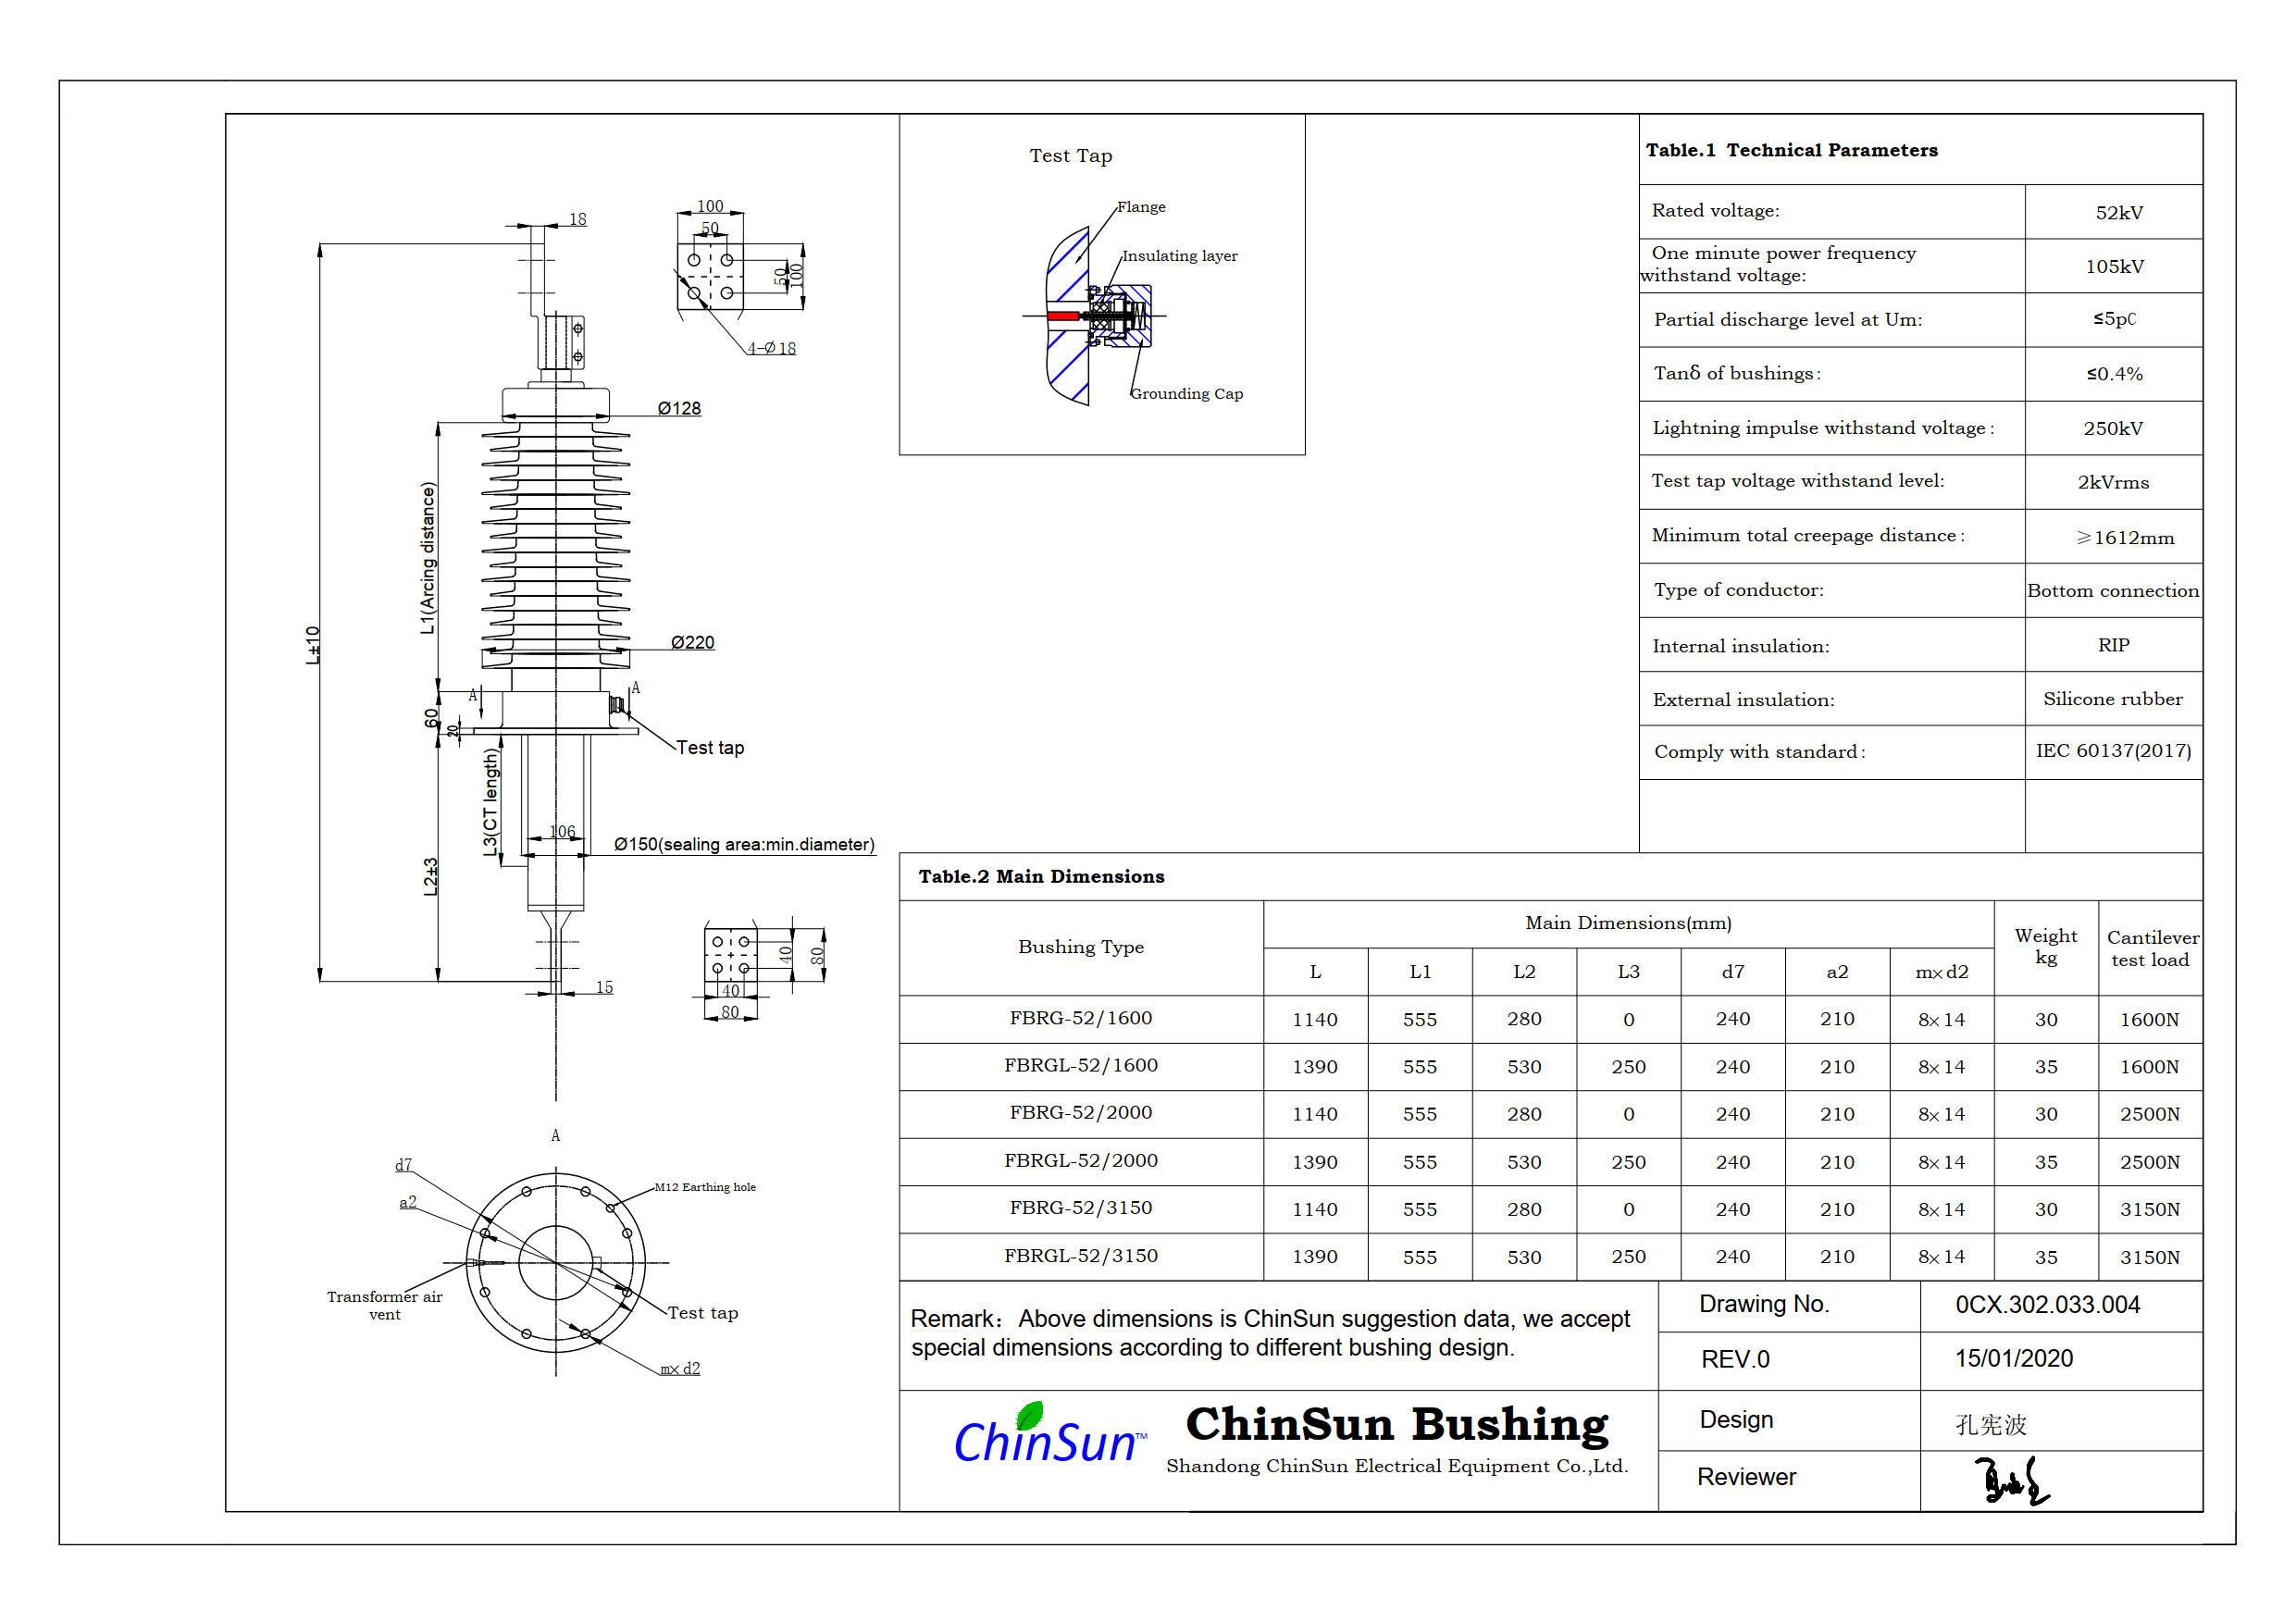 Drawing-transformer bushing-52kV_silicone rubber-BC-ChinSun